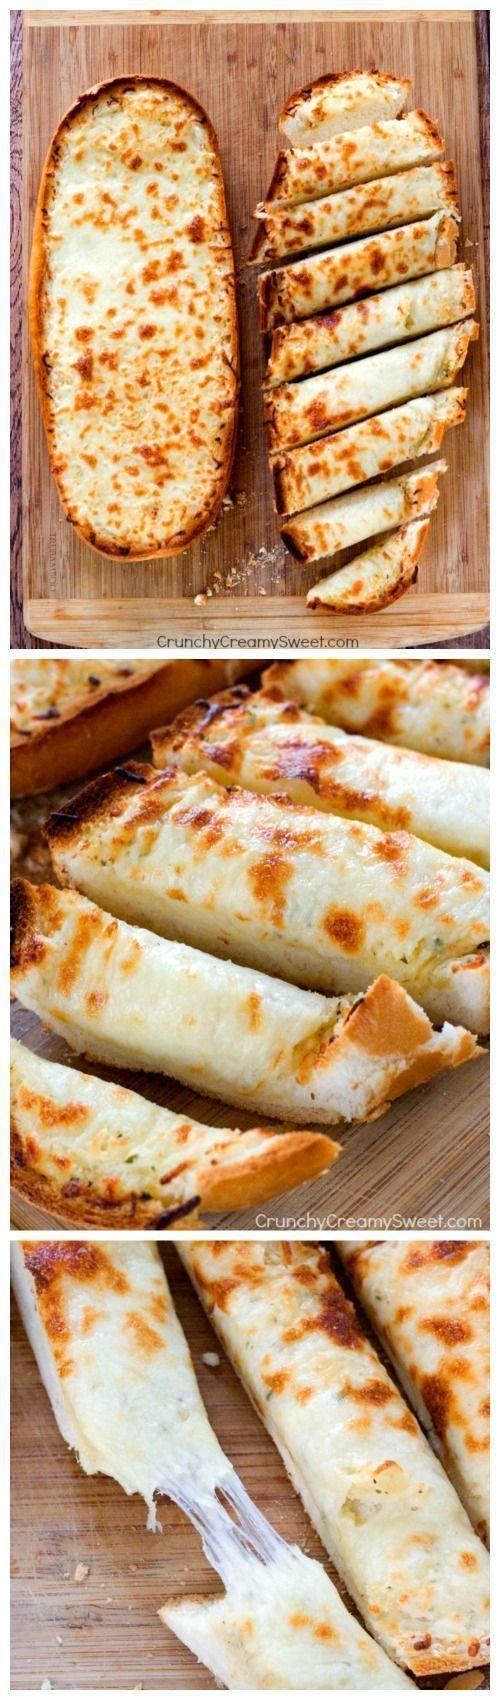 Easy Cheesy Garlic Bread ~ Made in just 20 minutes!   easy bread recipe